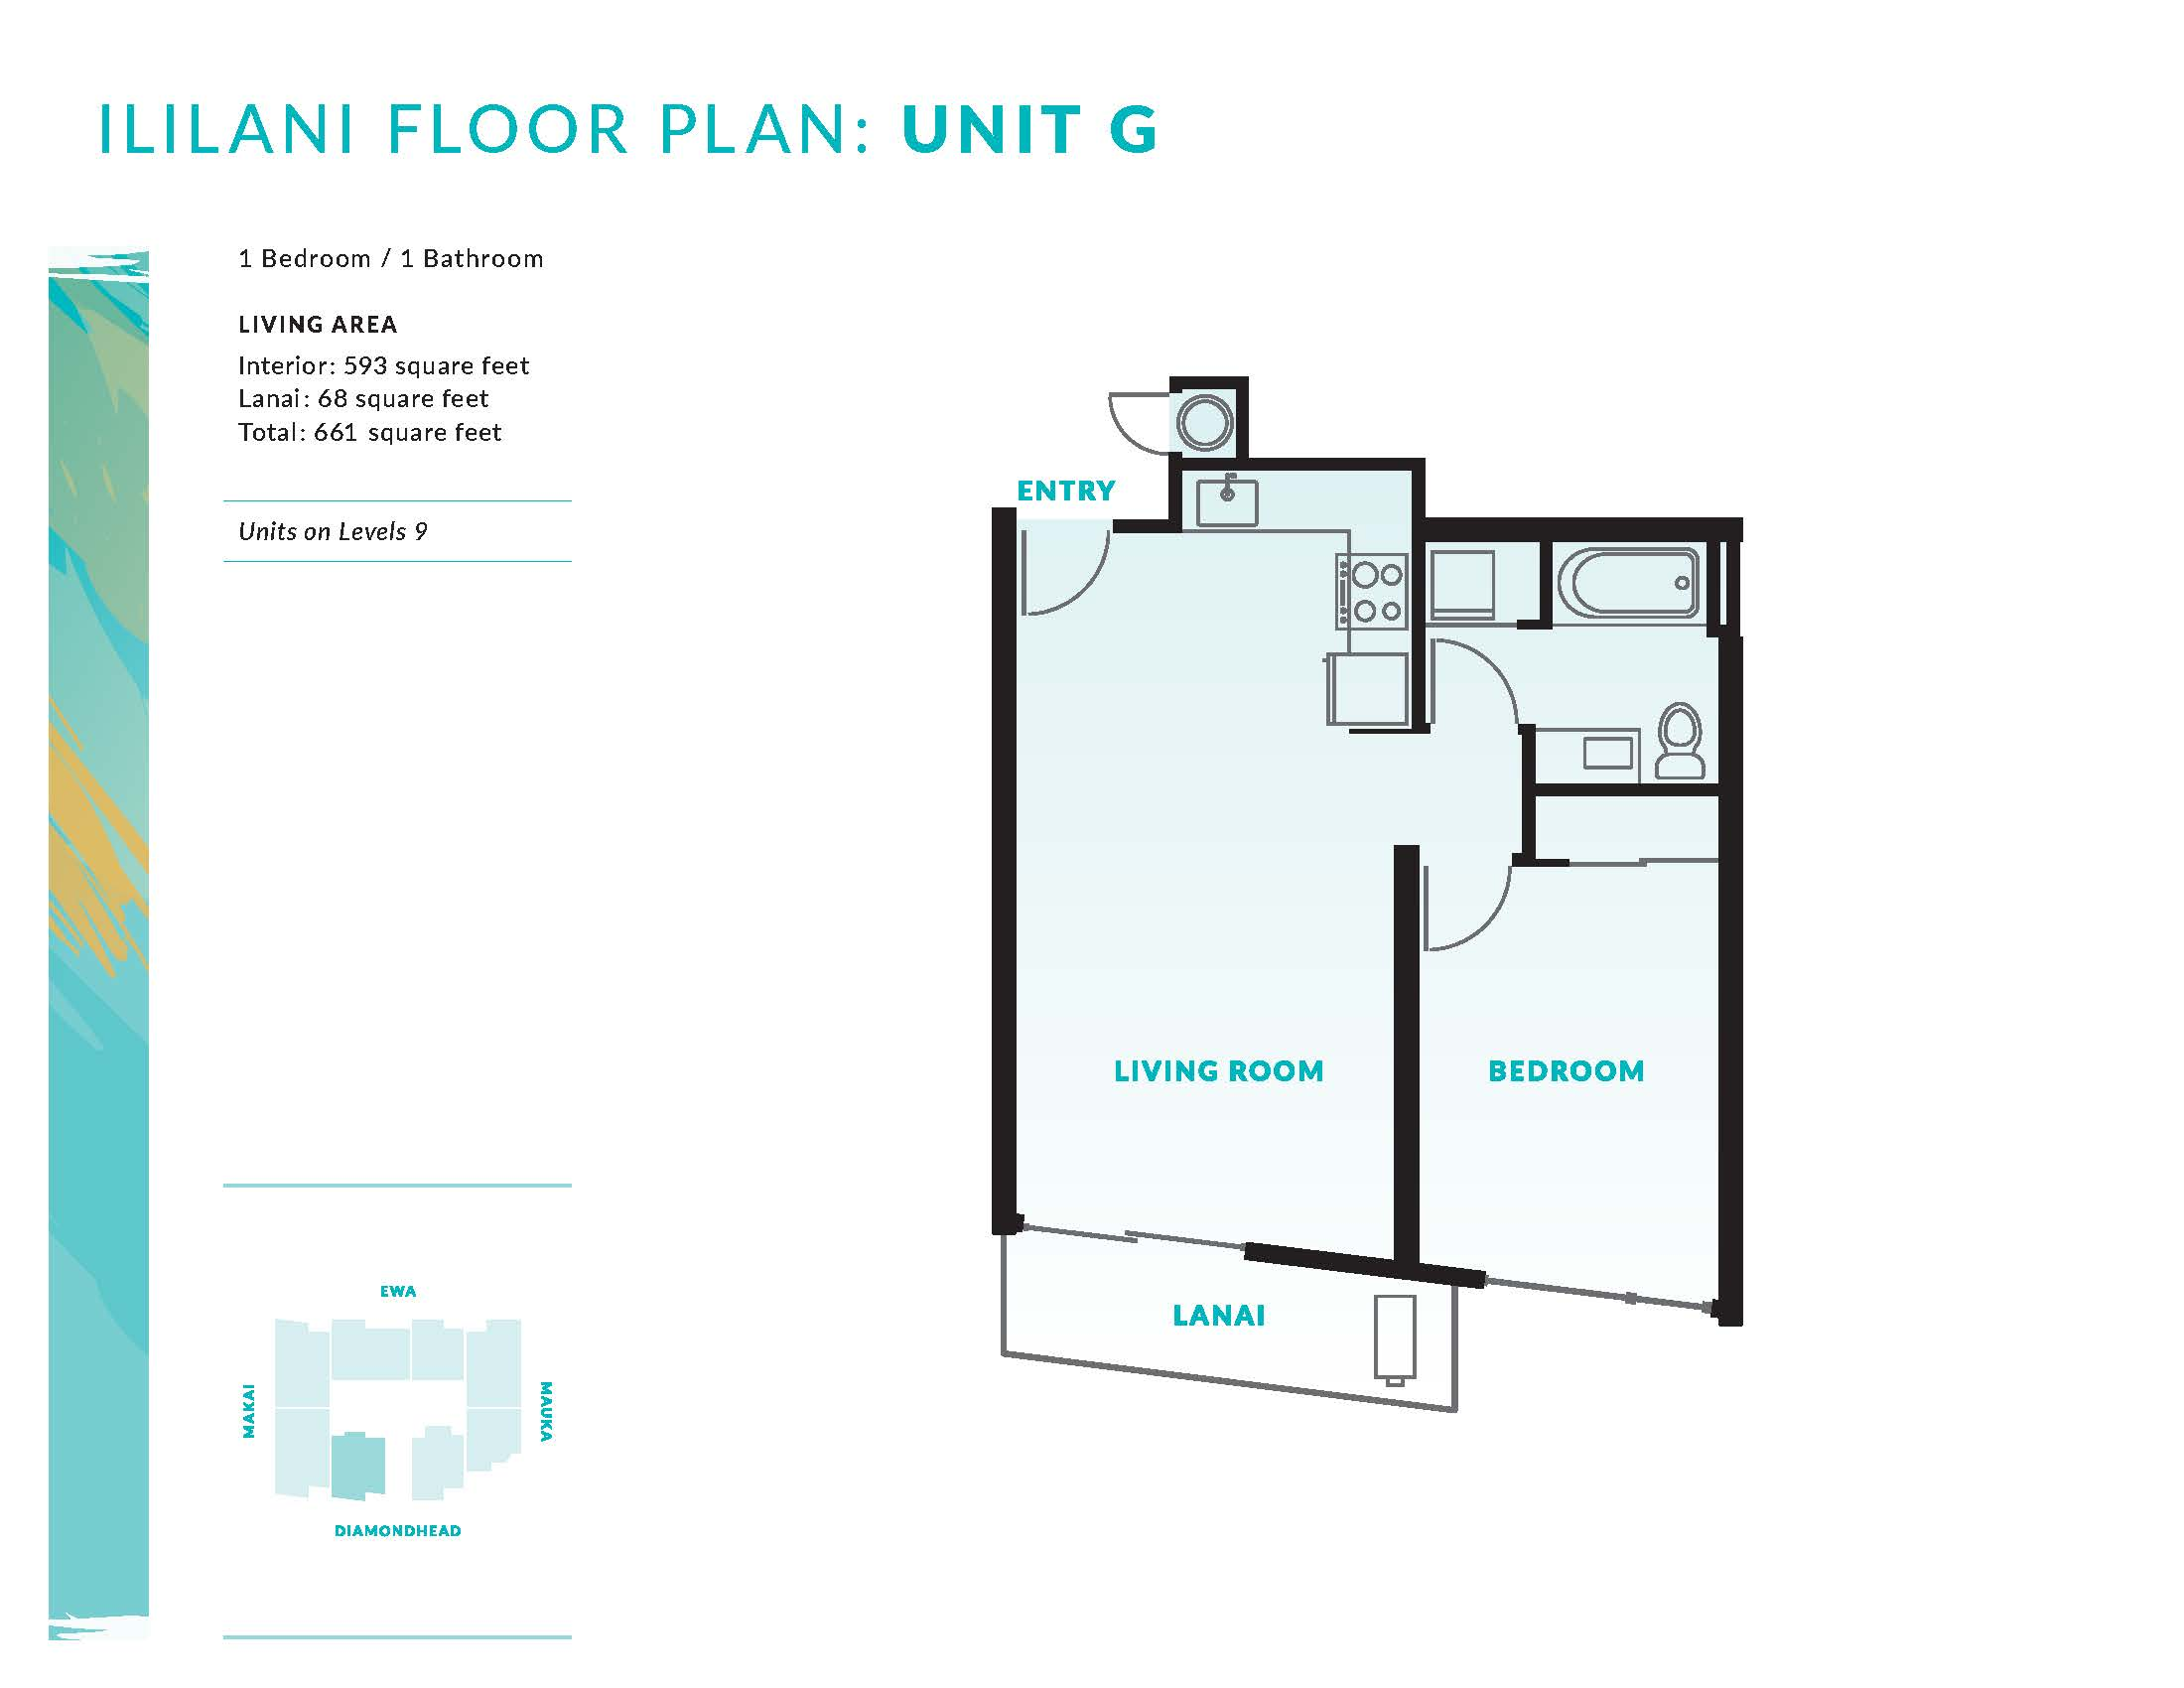 Ililani Floor Plan G